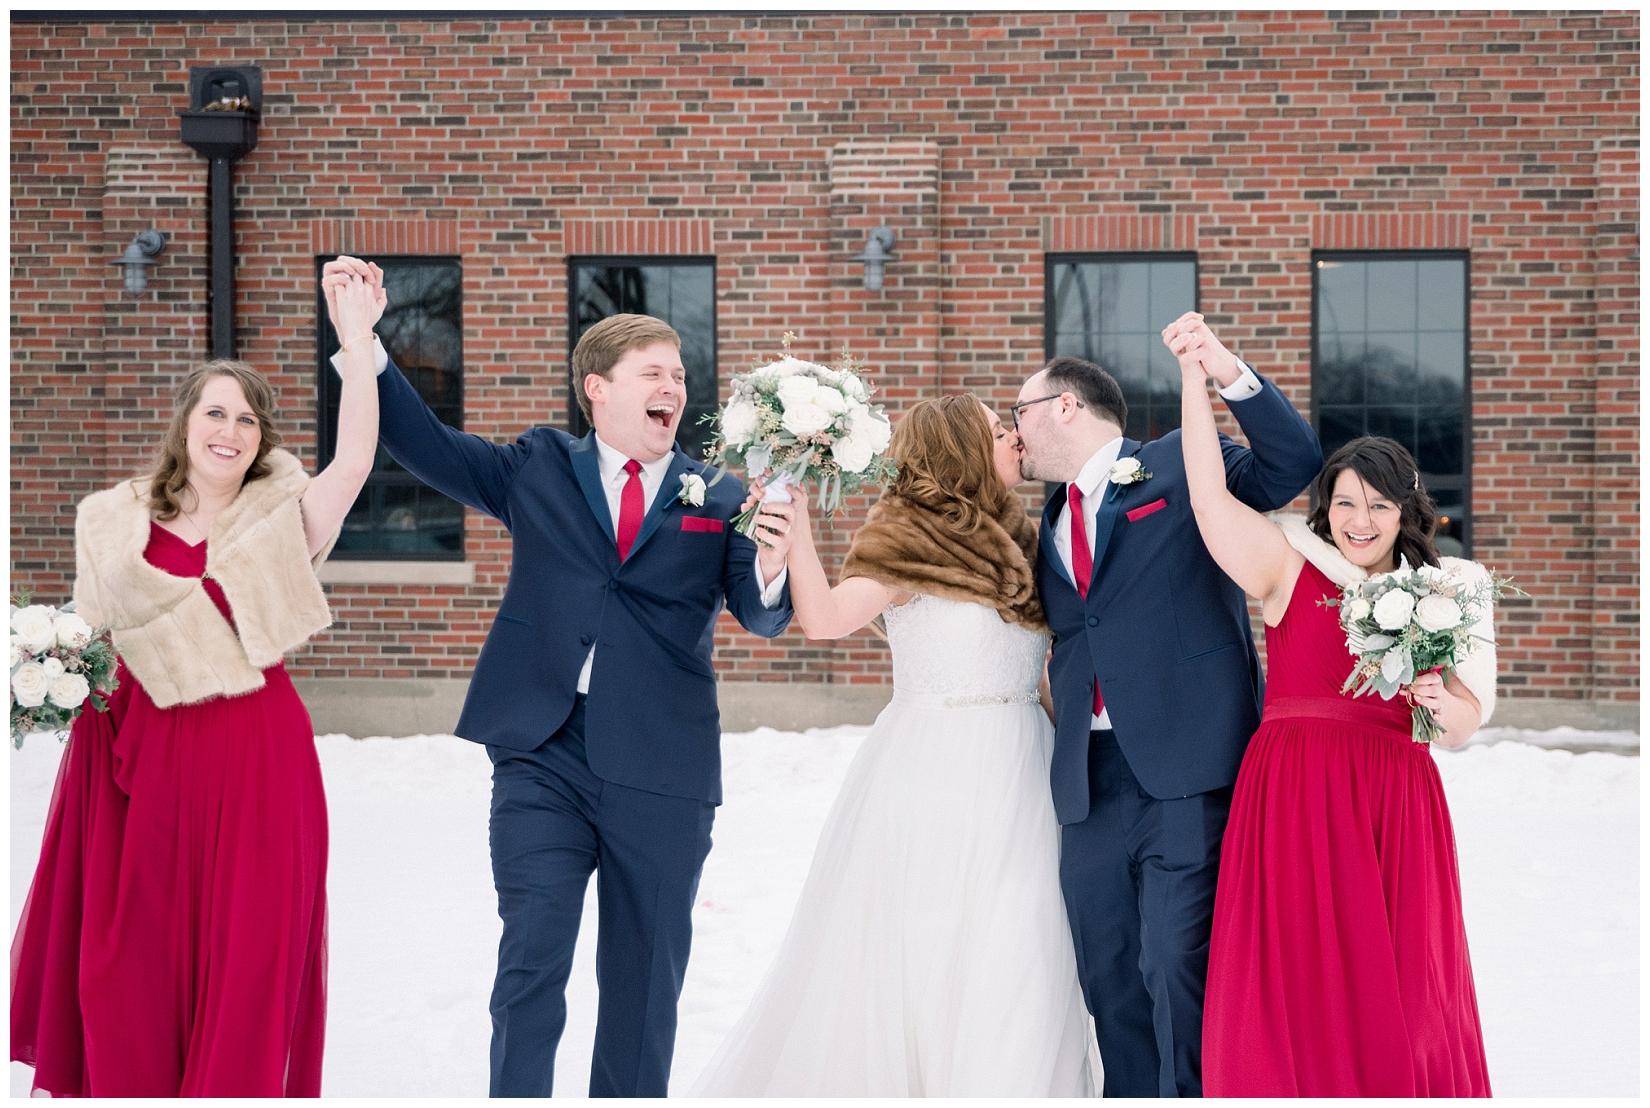 cat-alkire-wedding-photographer-indiana-chicago-indianapolis-fort-wayne_0956.jpg